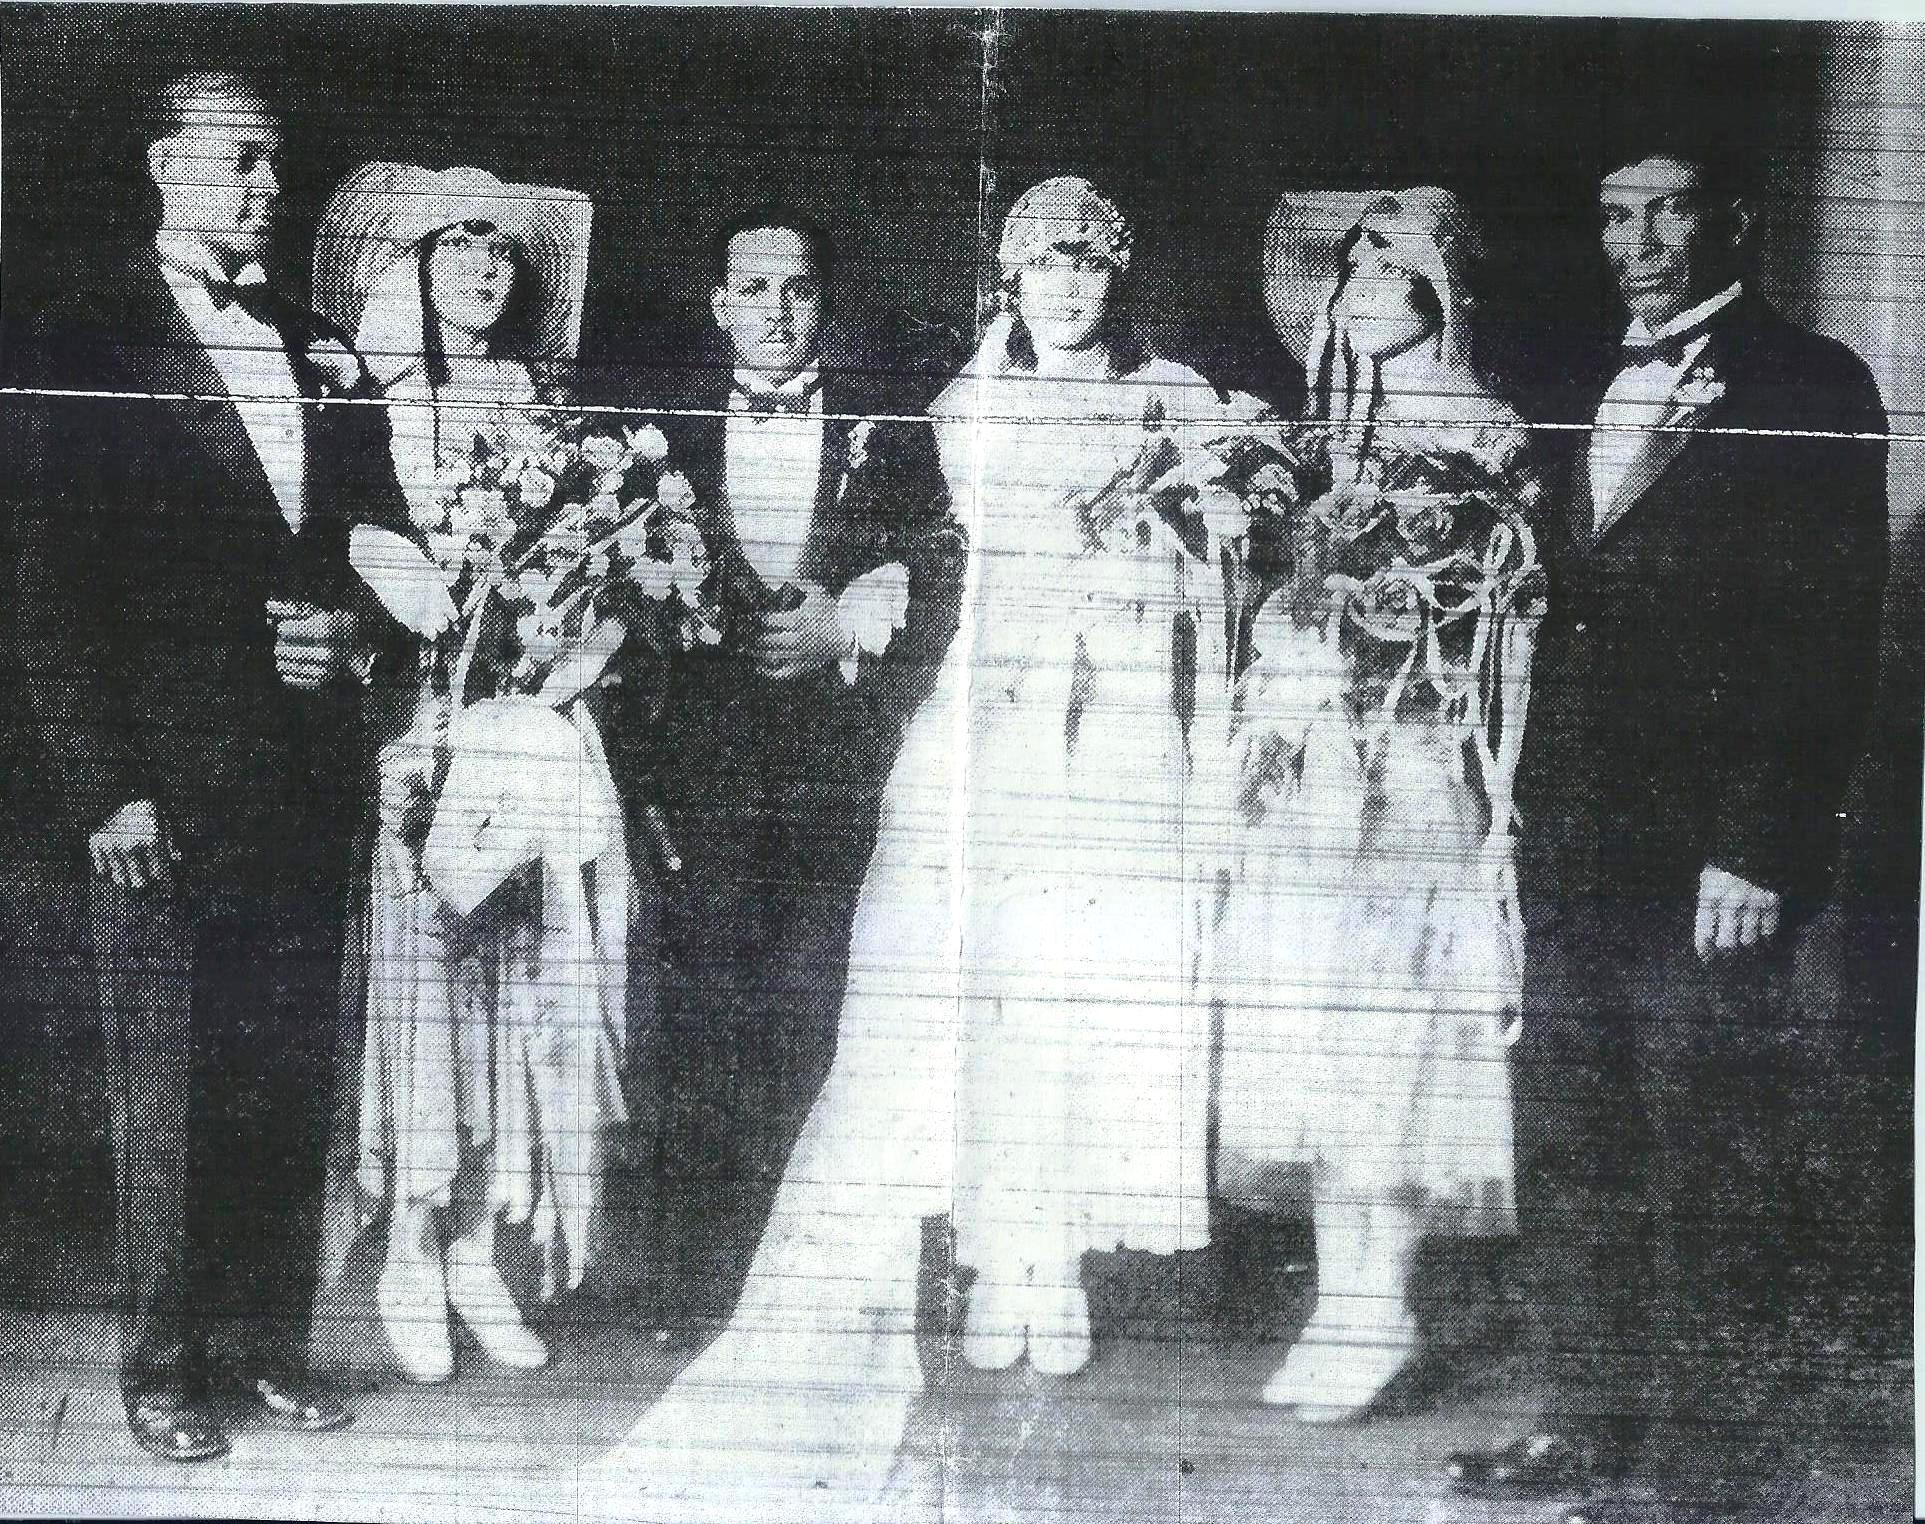 haydel brown nuptials a new orleans uptown wedding1930